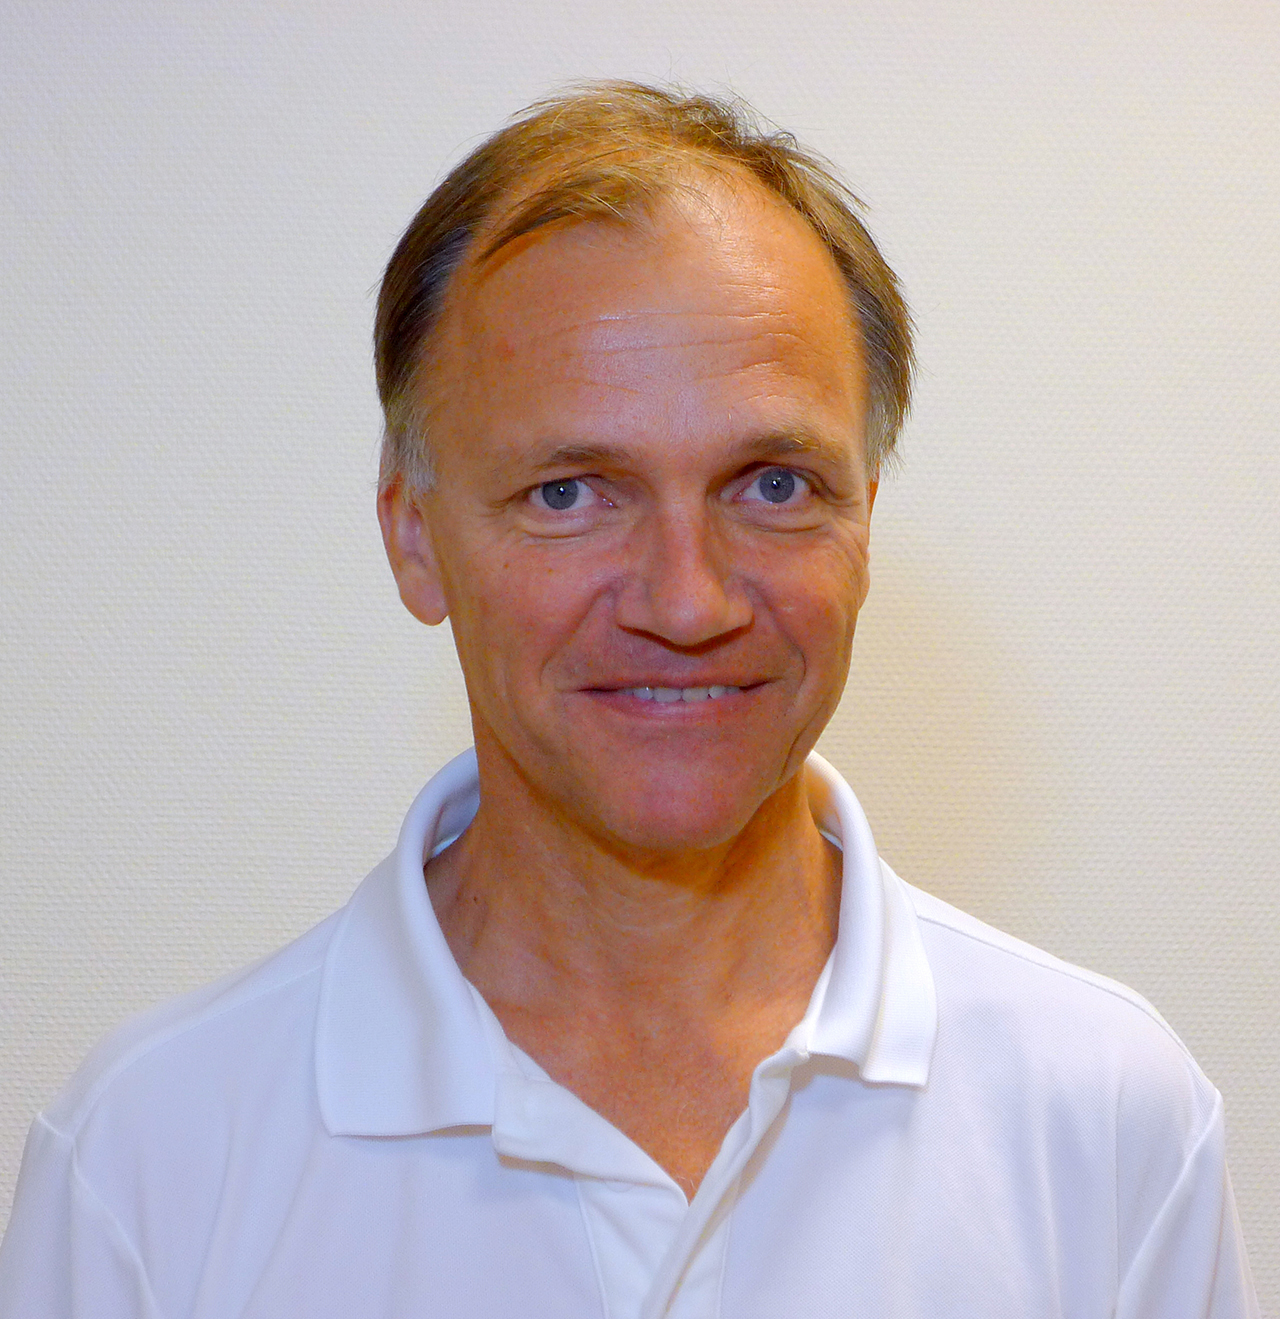 JAN HARALD LØNN